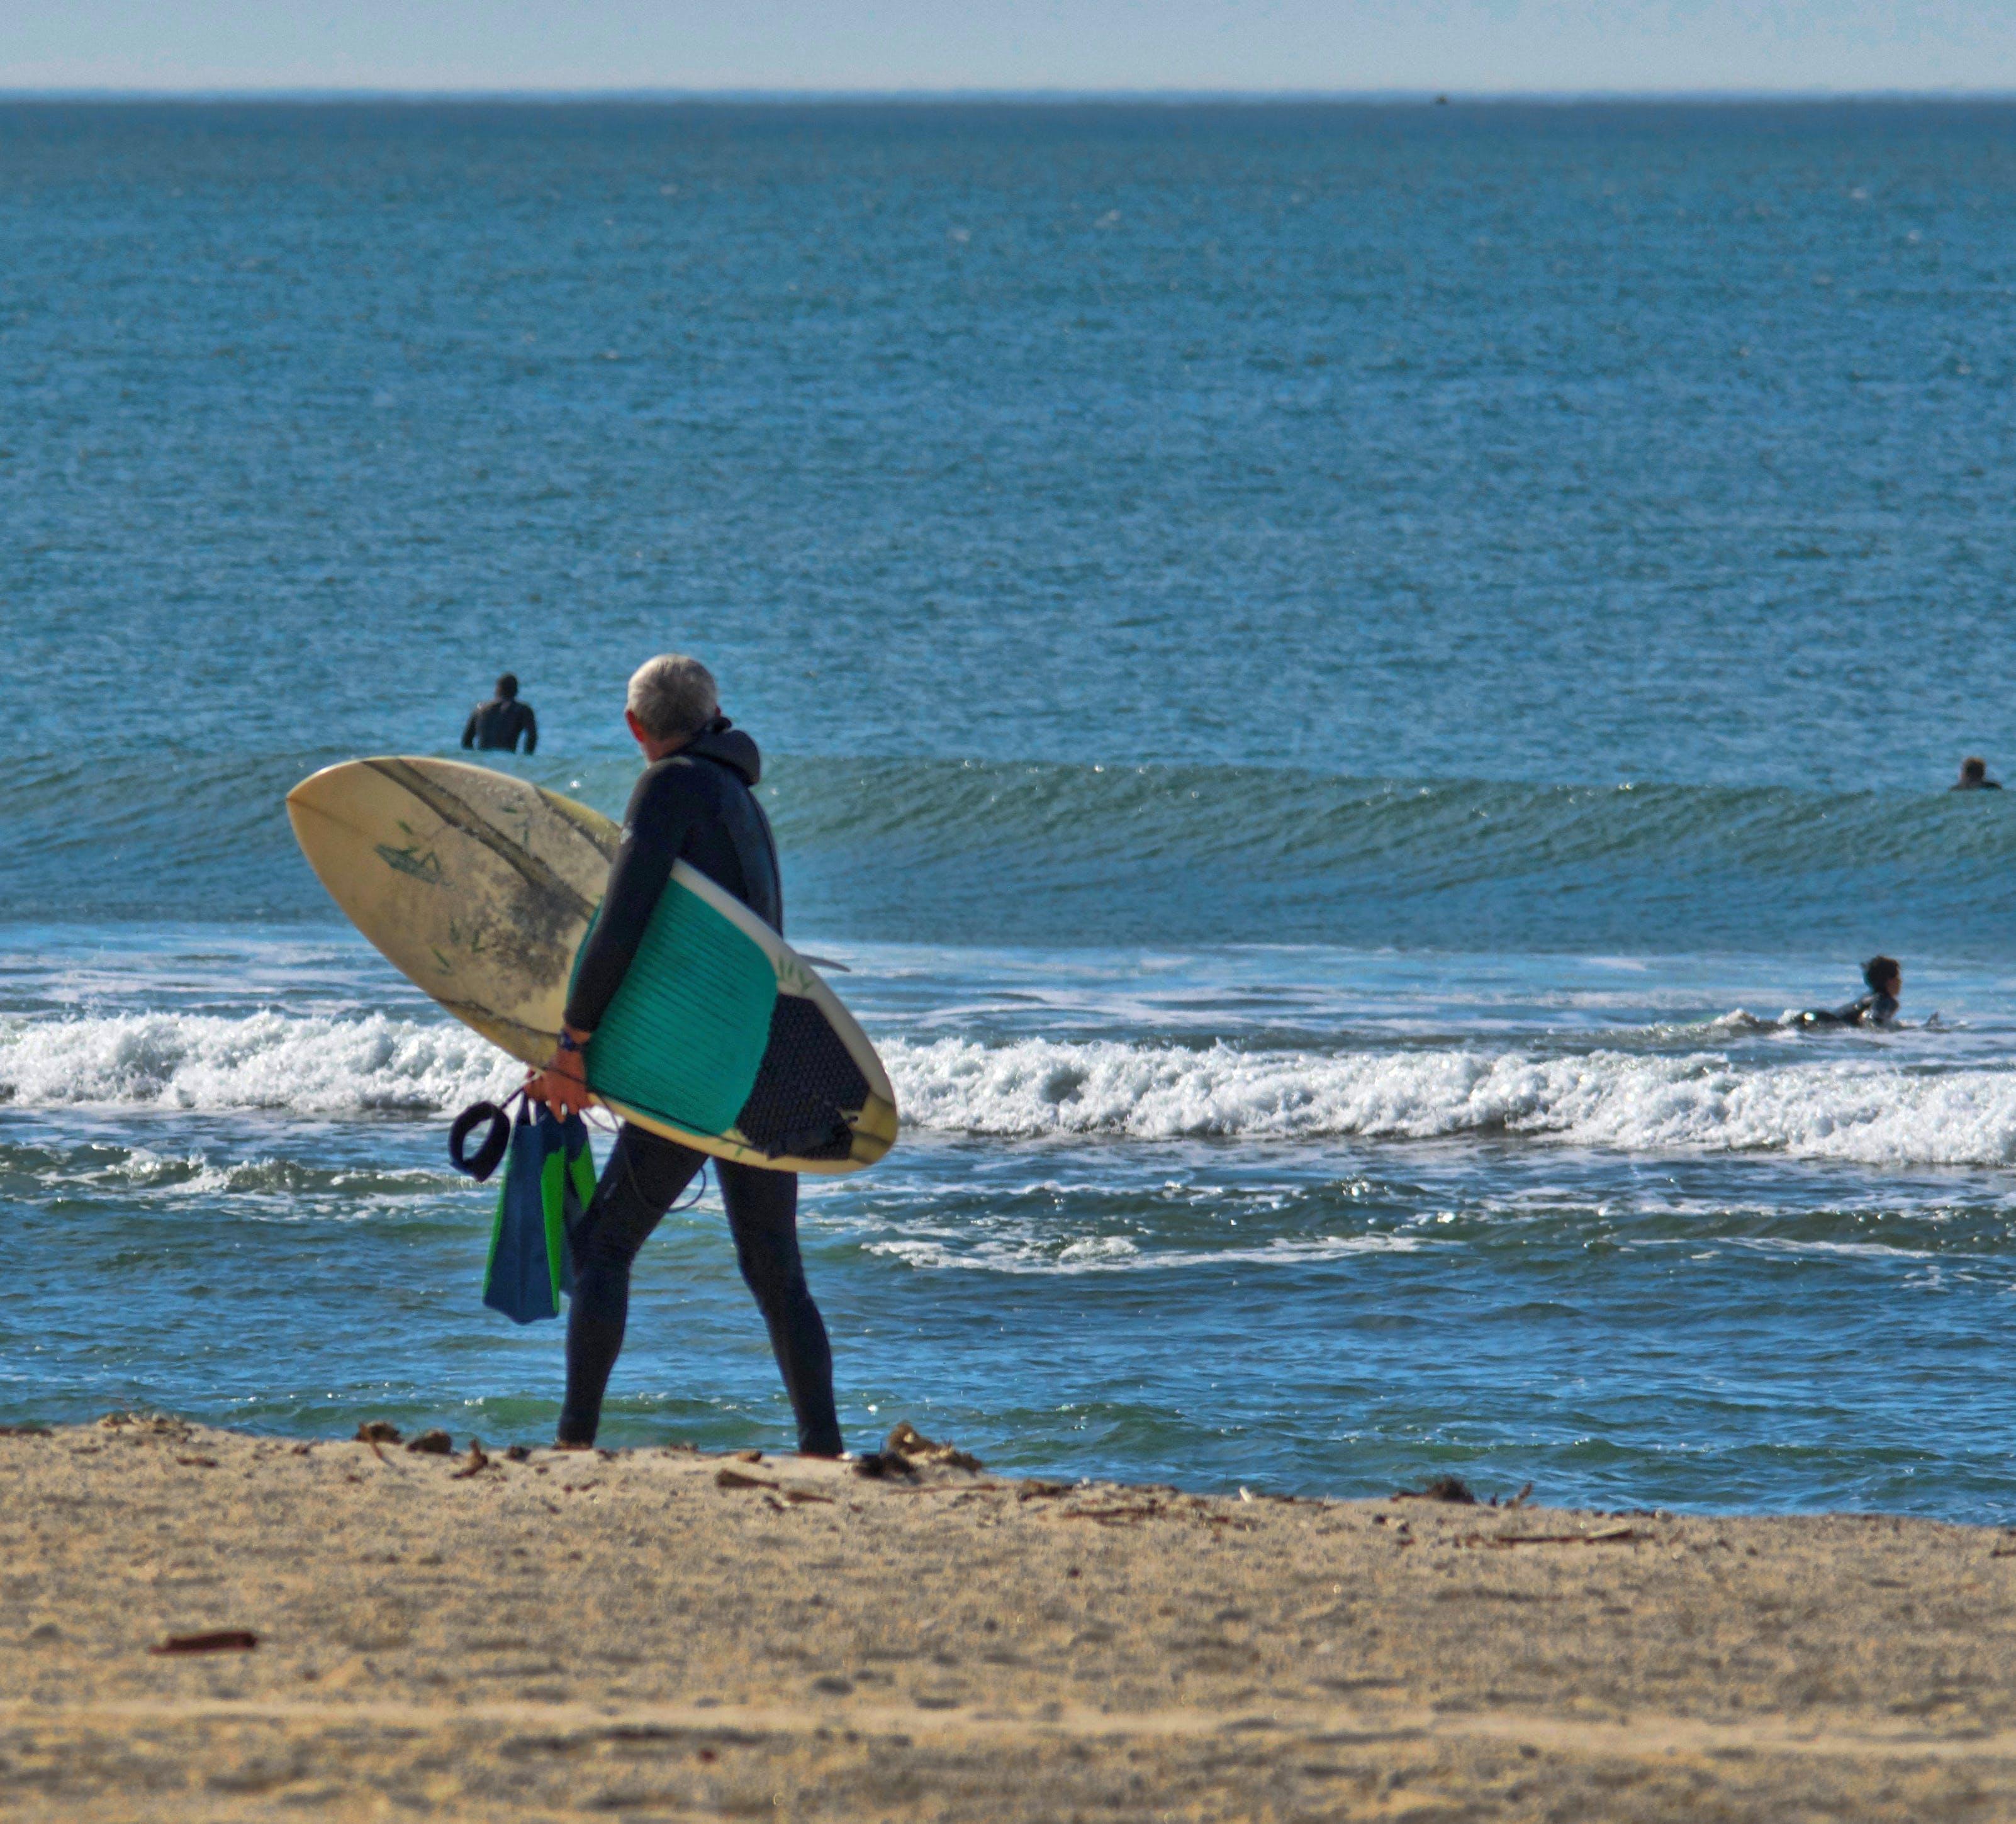 Free stock photo of beach, sand, surfer, lifeguard